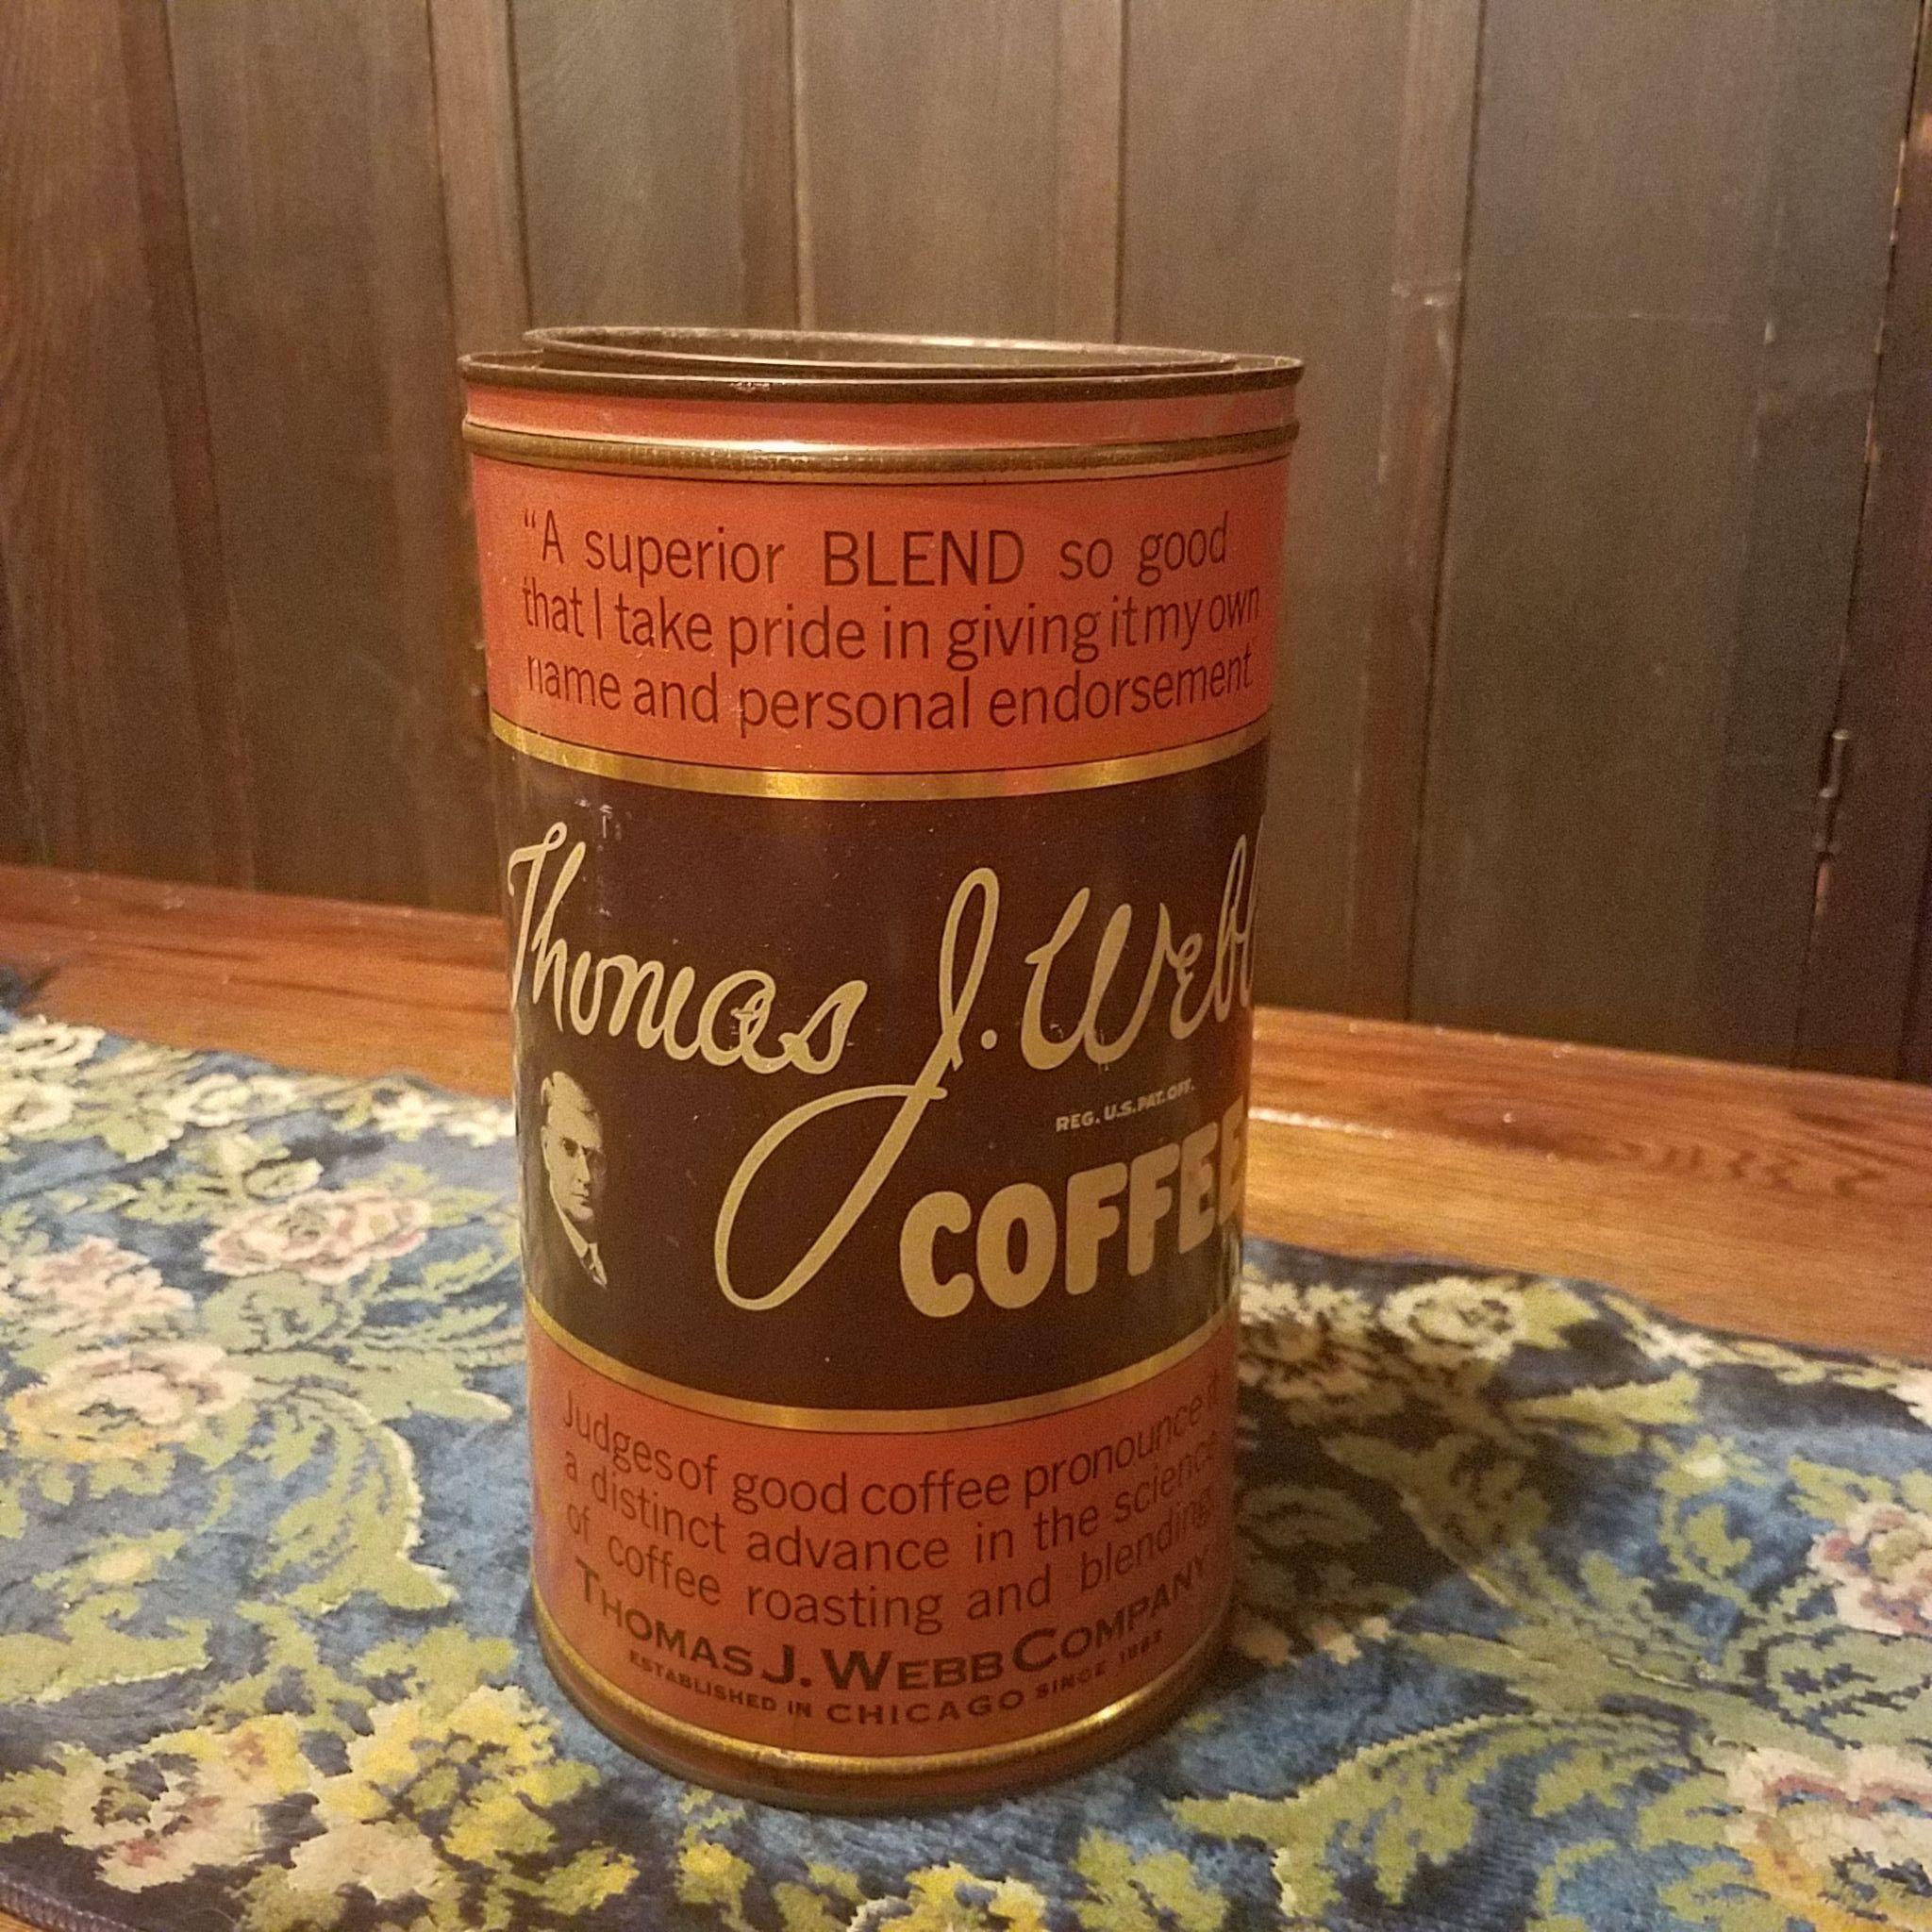 Thomas J Webb Coffee Tin